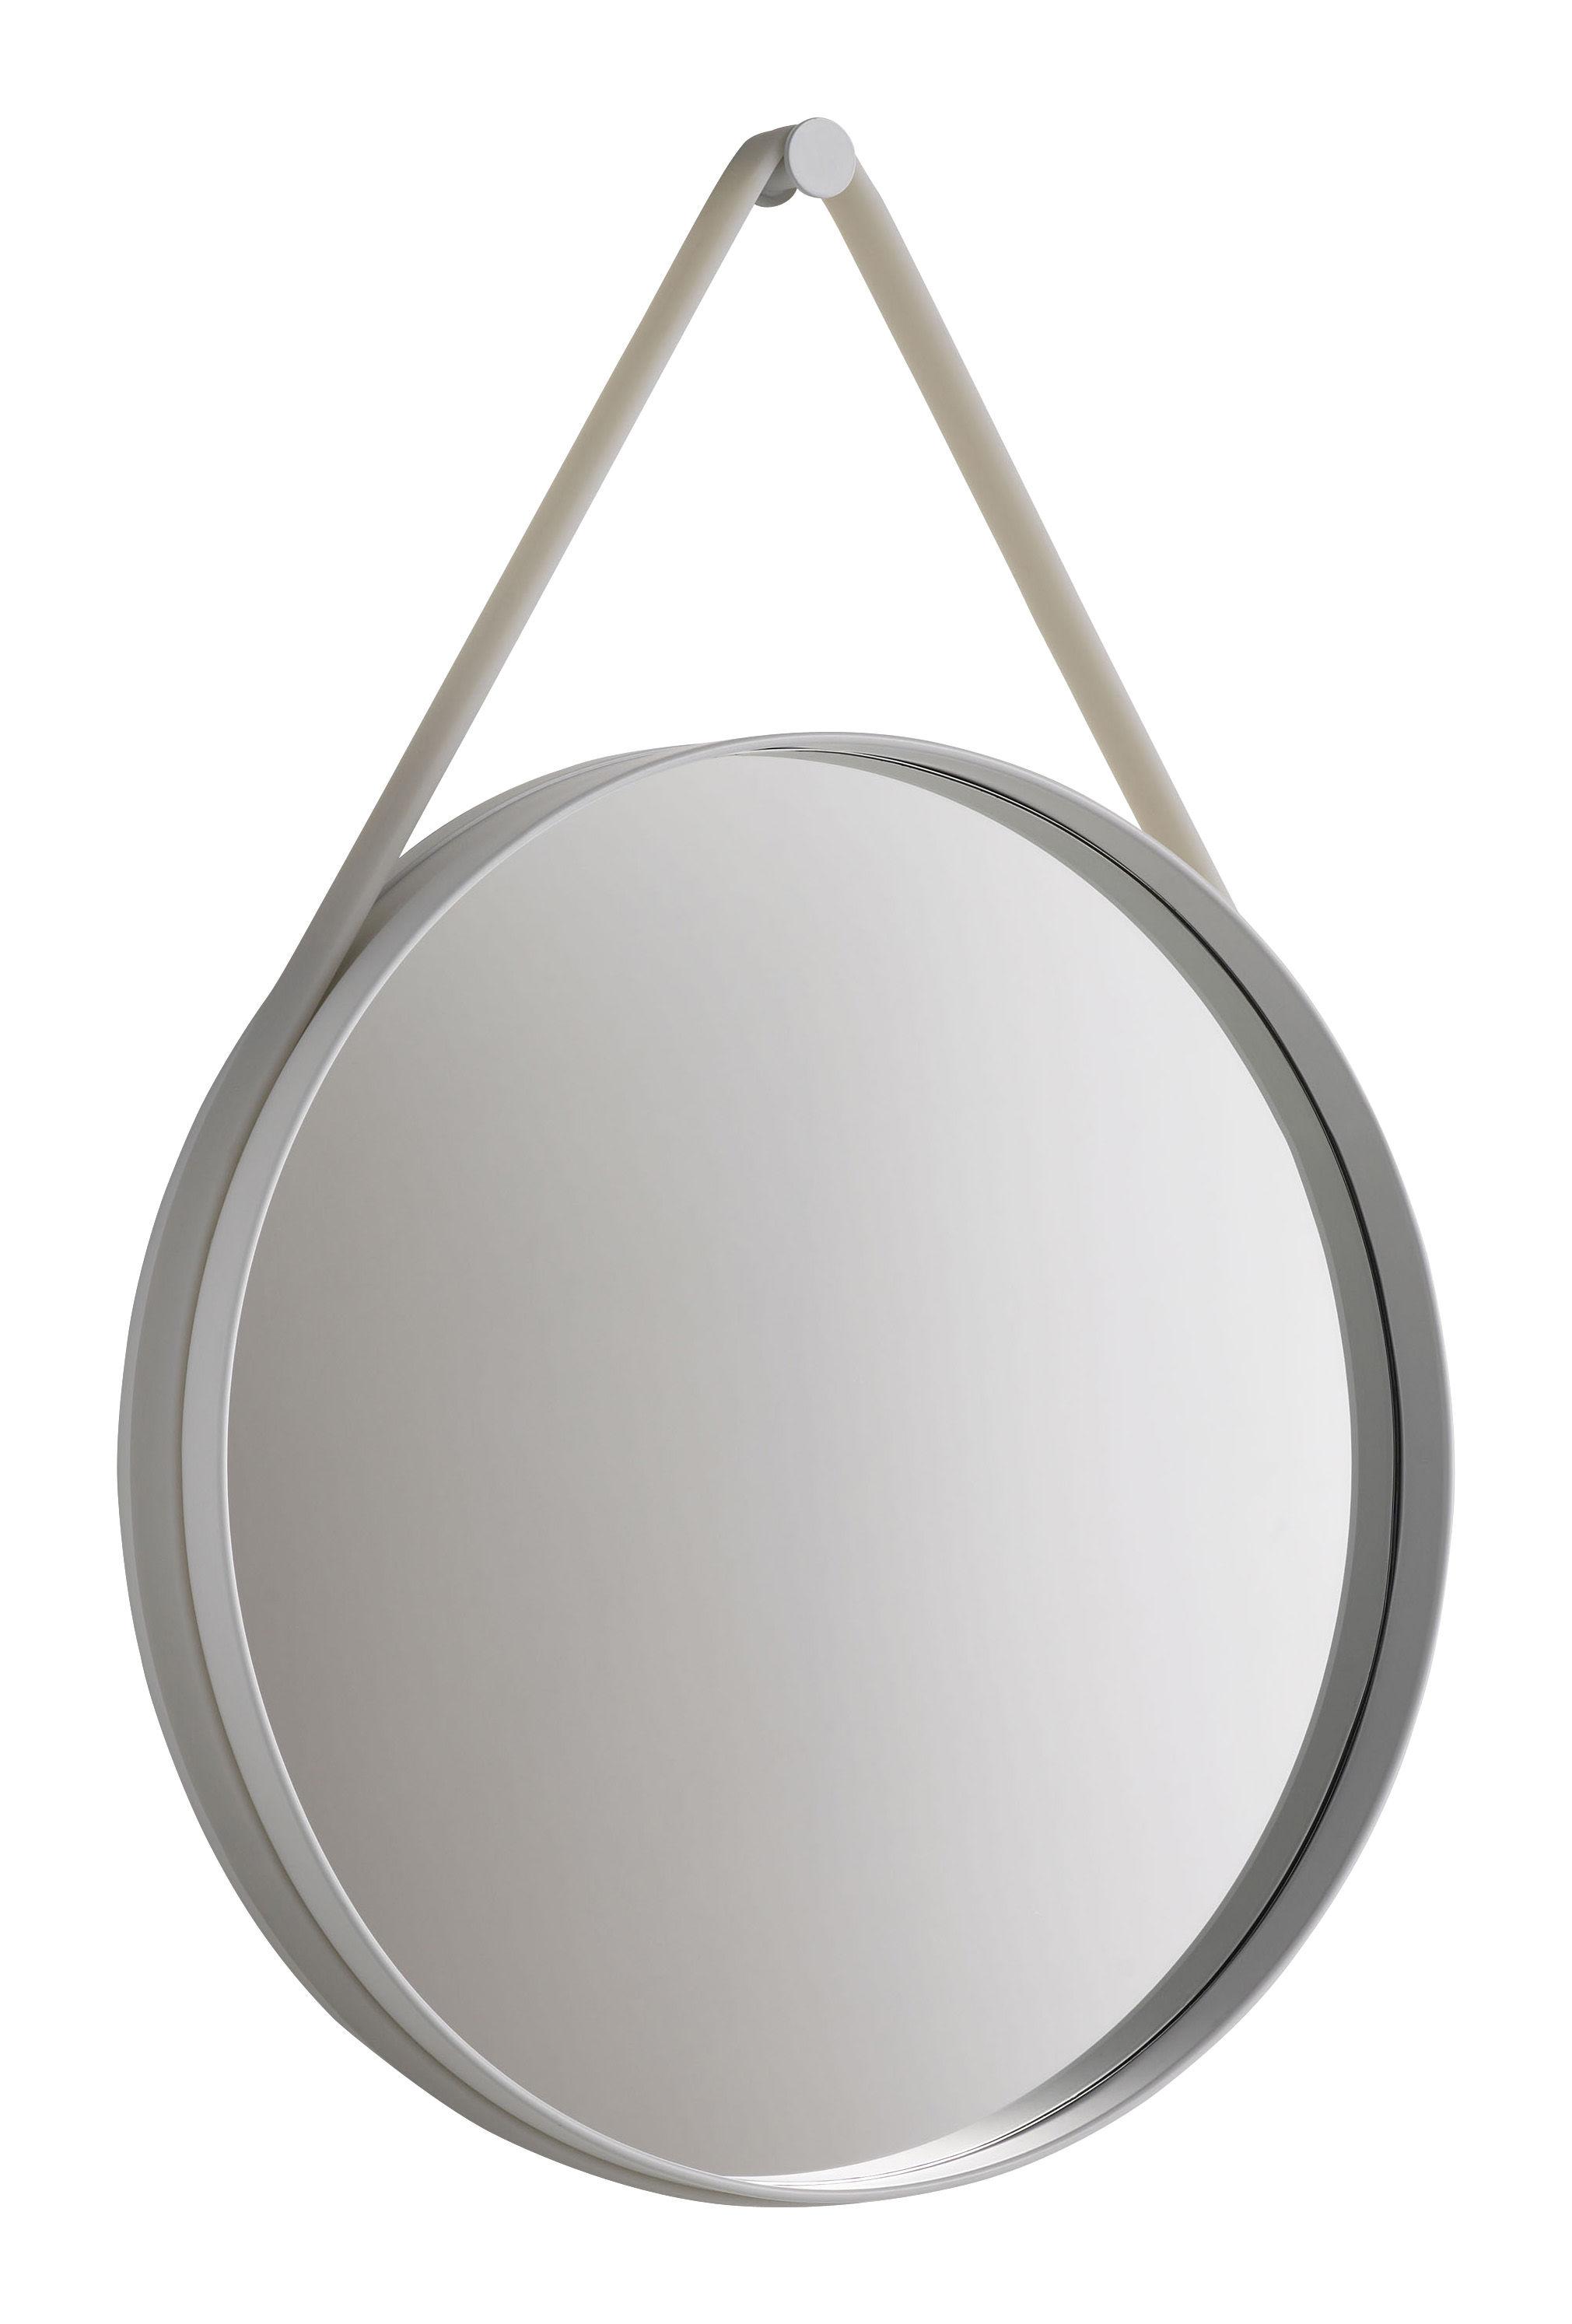 Möbel - Spiegel - Strap Wandspiegel Ø 50 cm - Hay - Ø 50 cm -  Fassung hellgrau / Halteband hellgrau - lackierter Stahl, Silikon